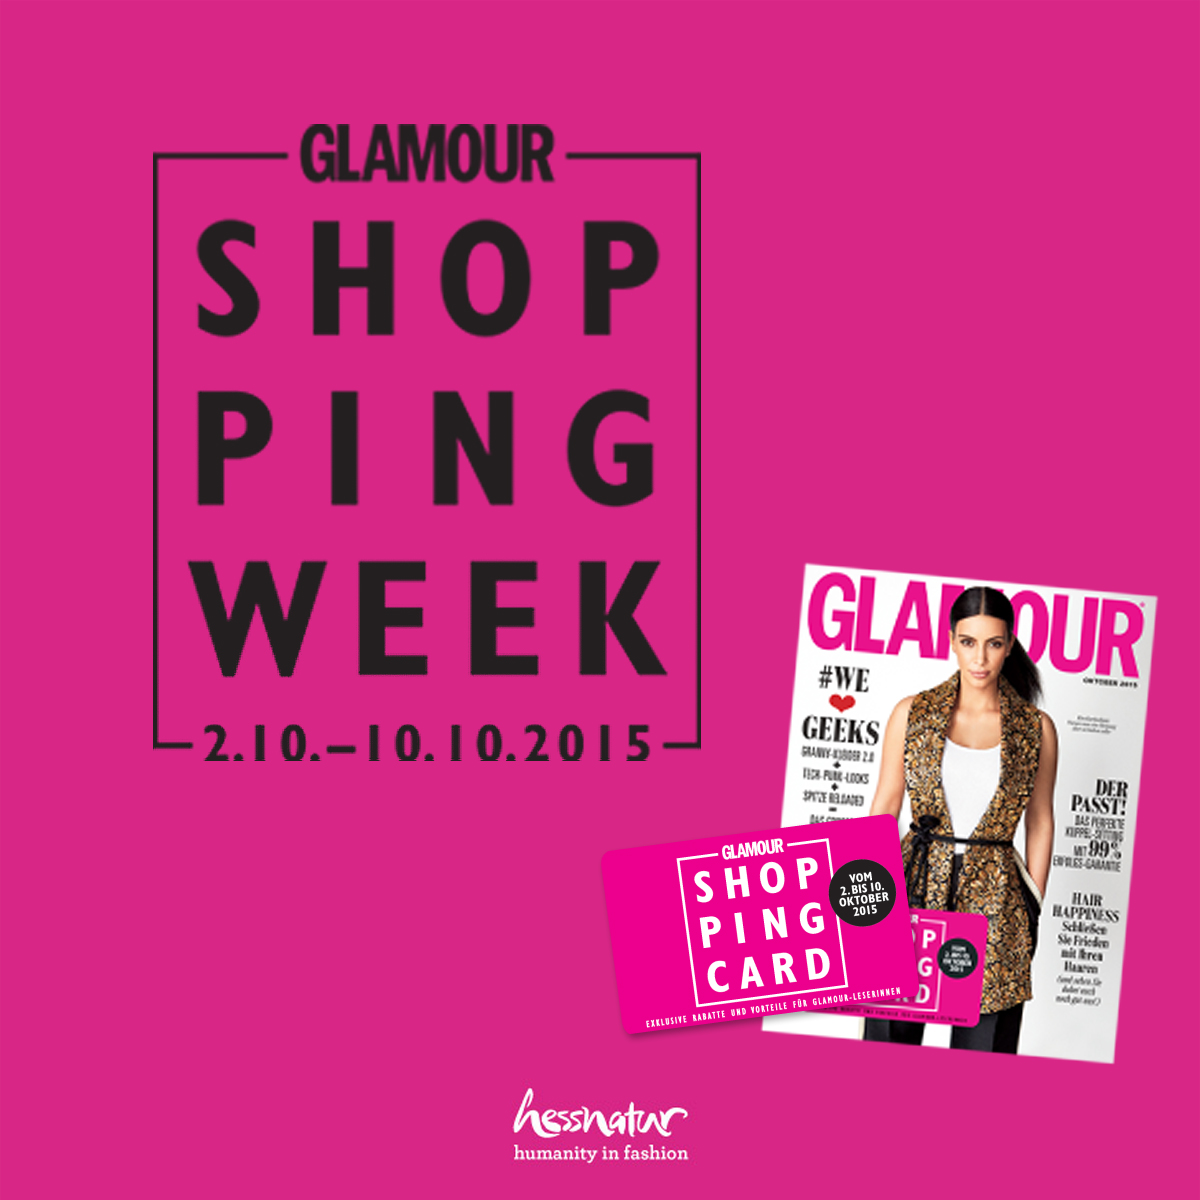 glamour karte Es geht los: Die Glamour Shopping Week!   hessnatur Magazin glamour karte